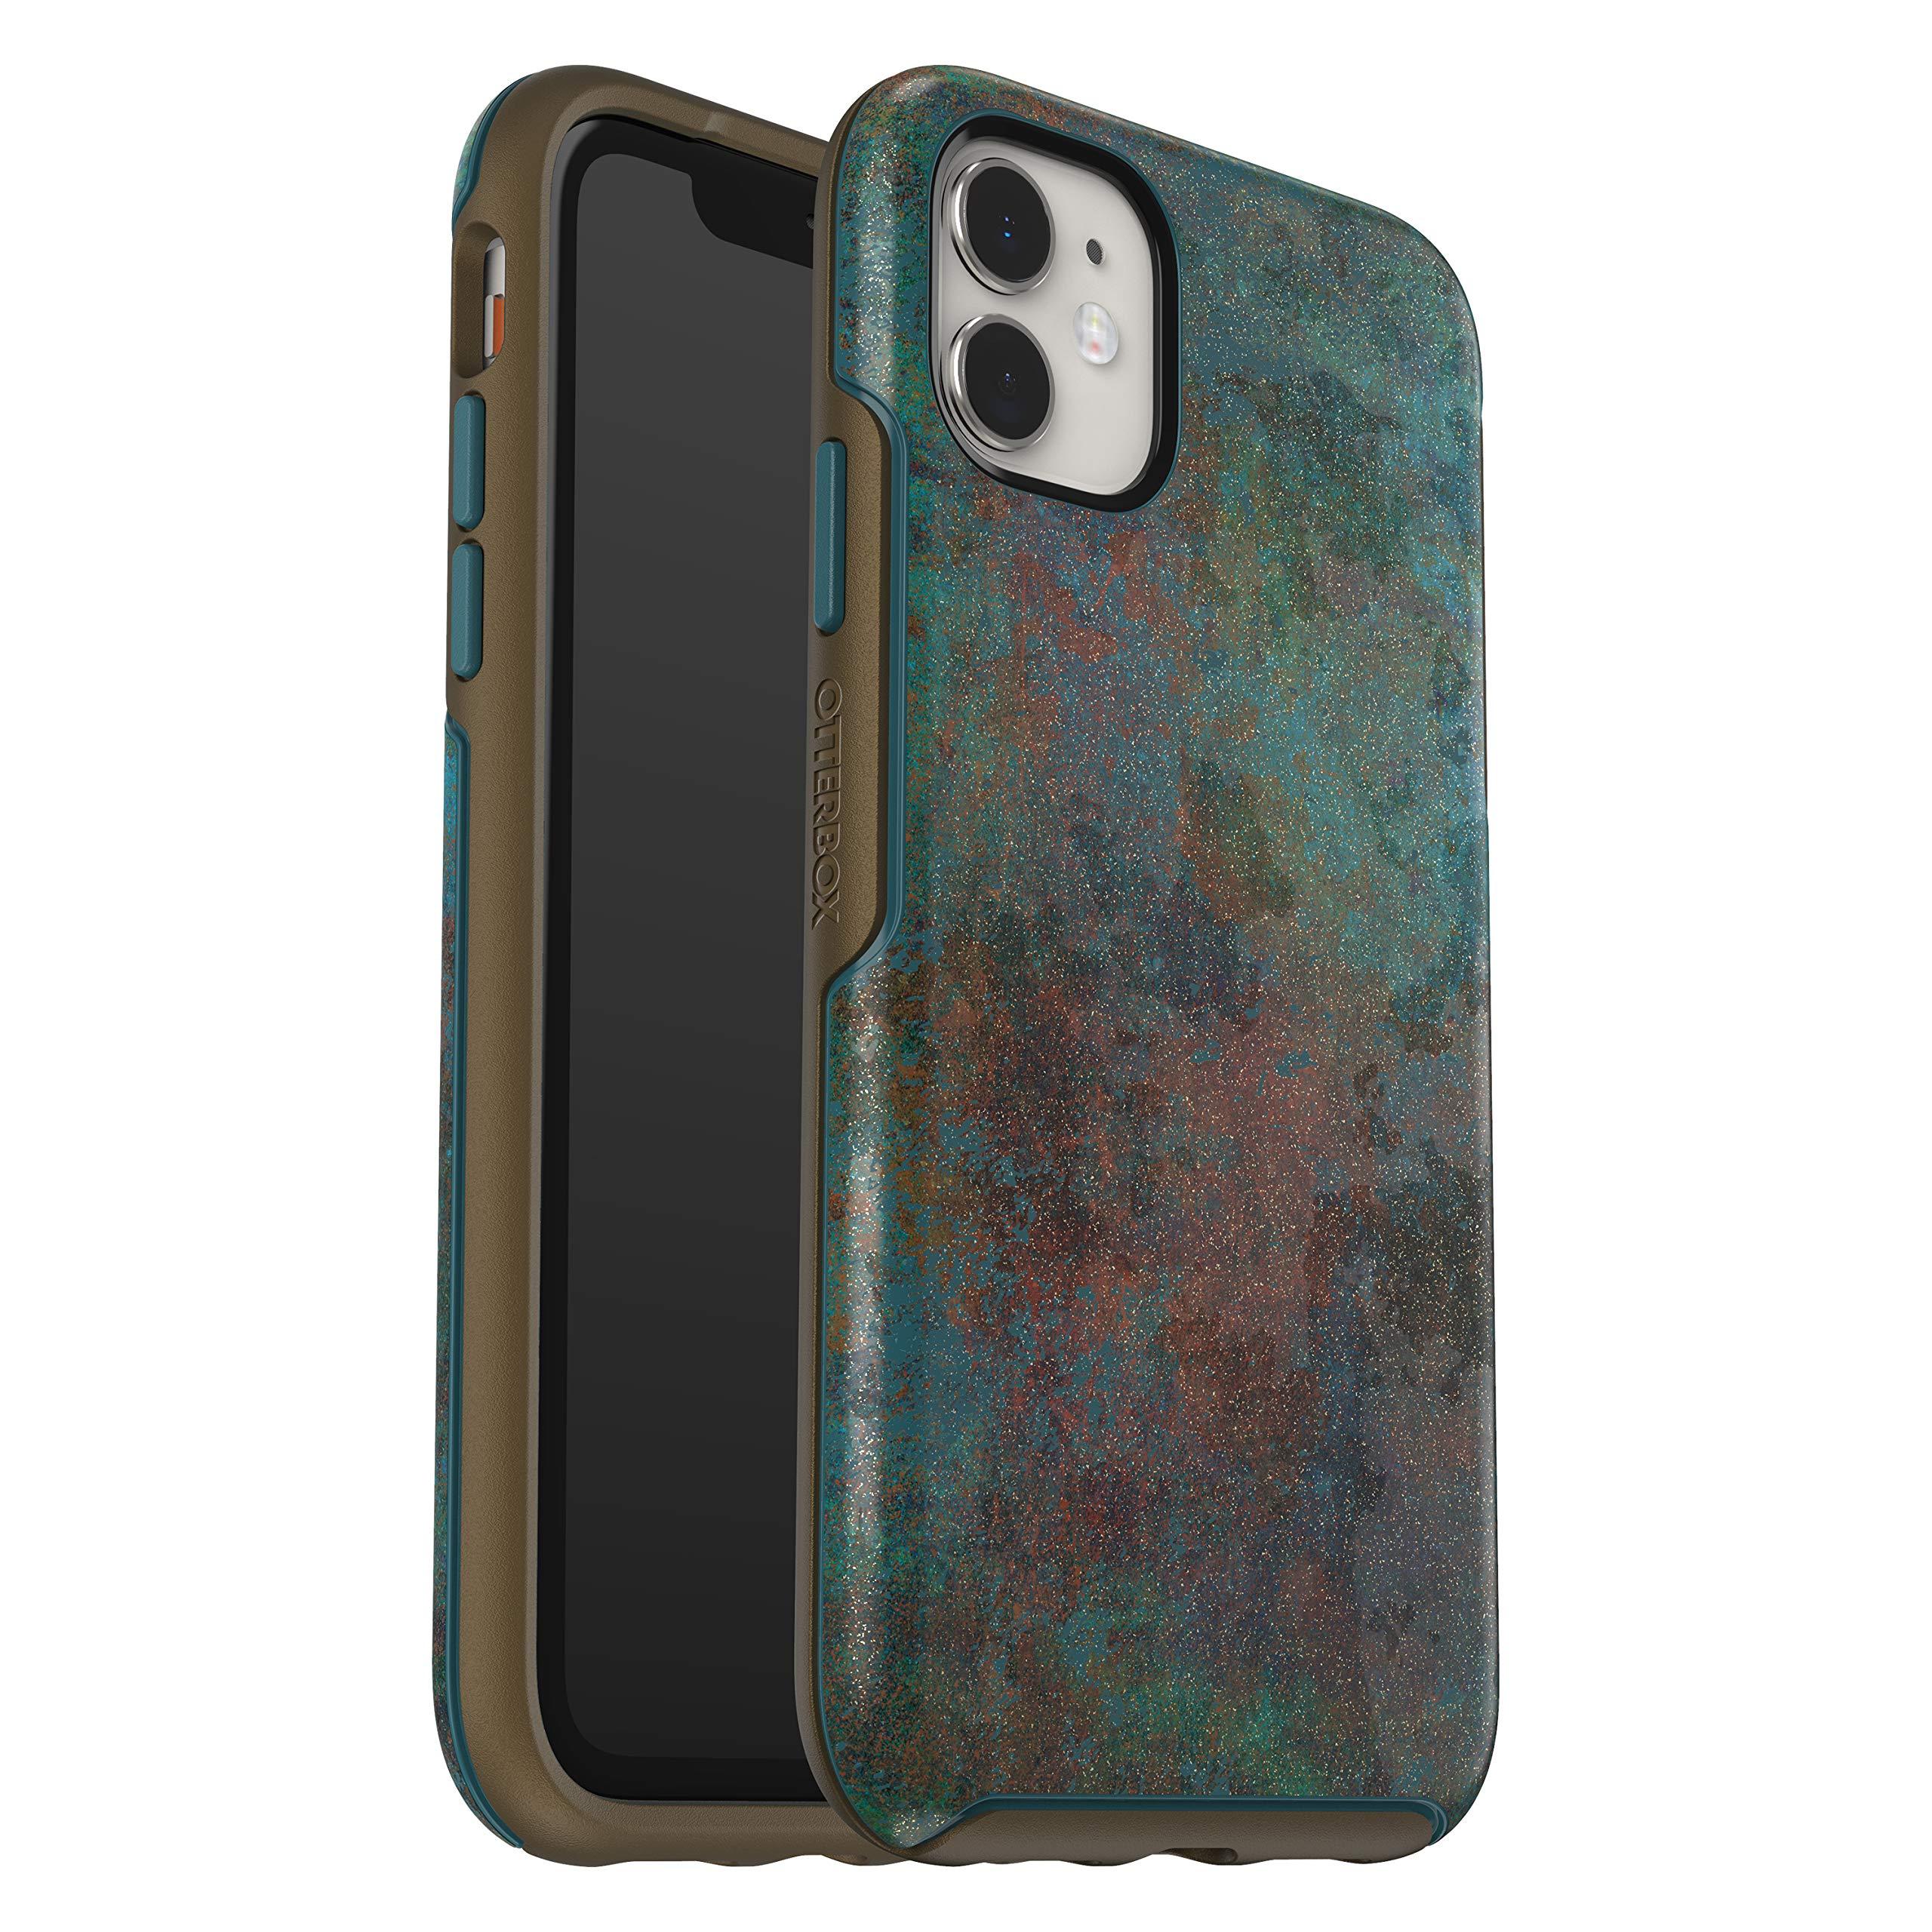 OtterBox SYMMETRY SERIES Case for iPhone 11 - FEELING RUSTY (COLONIAL BLUE/BRONZE/FEELING RUSTY IML)